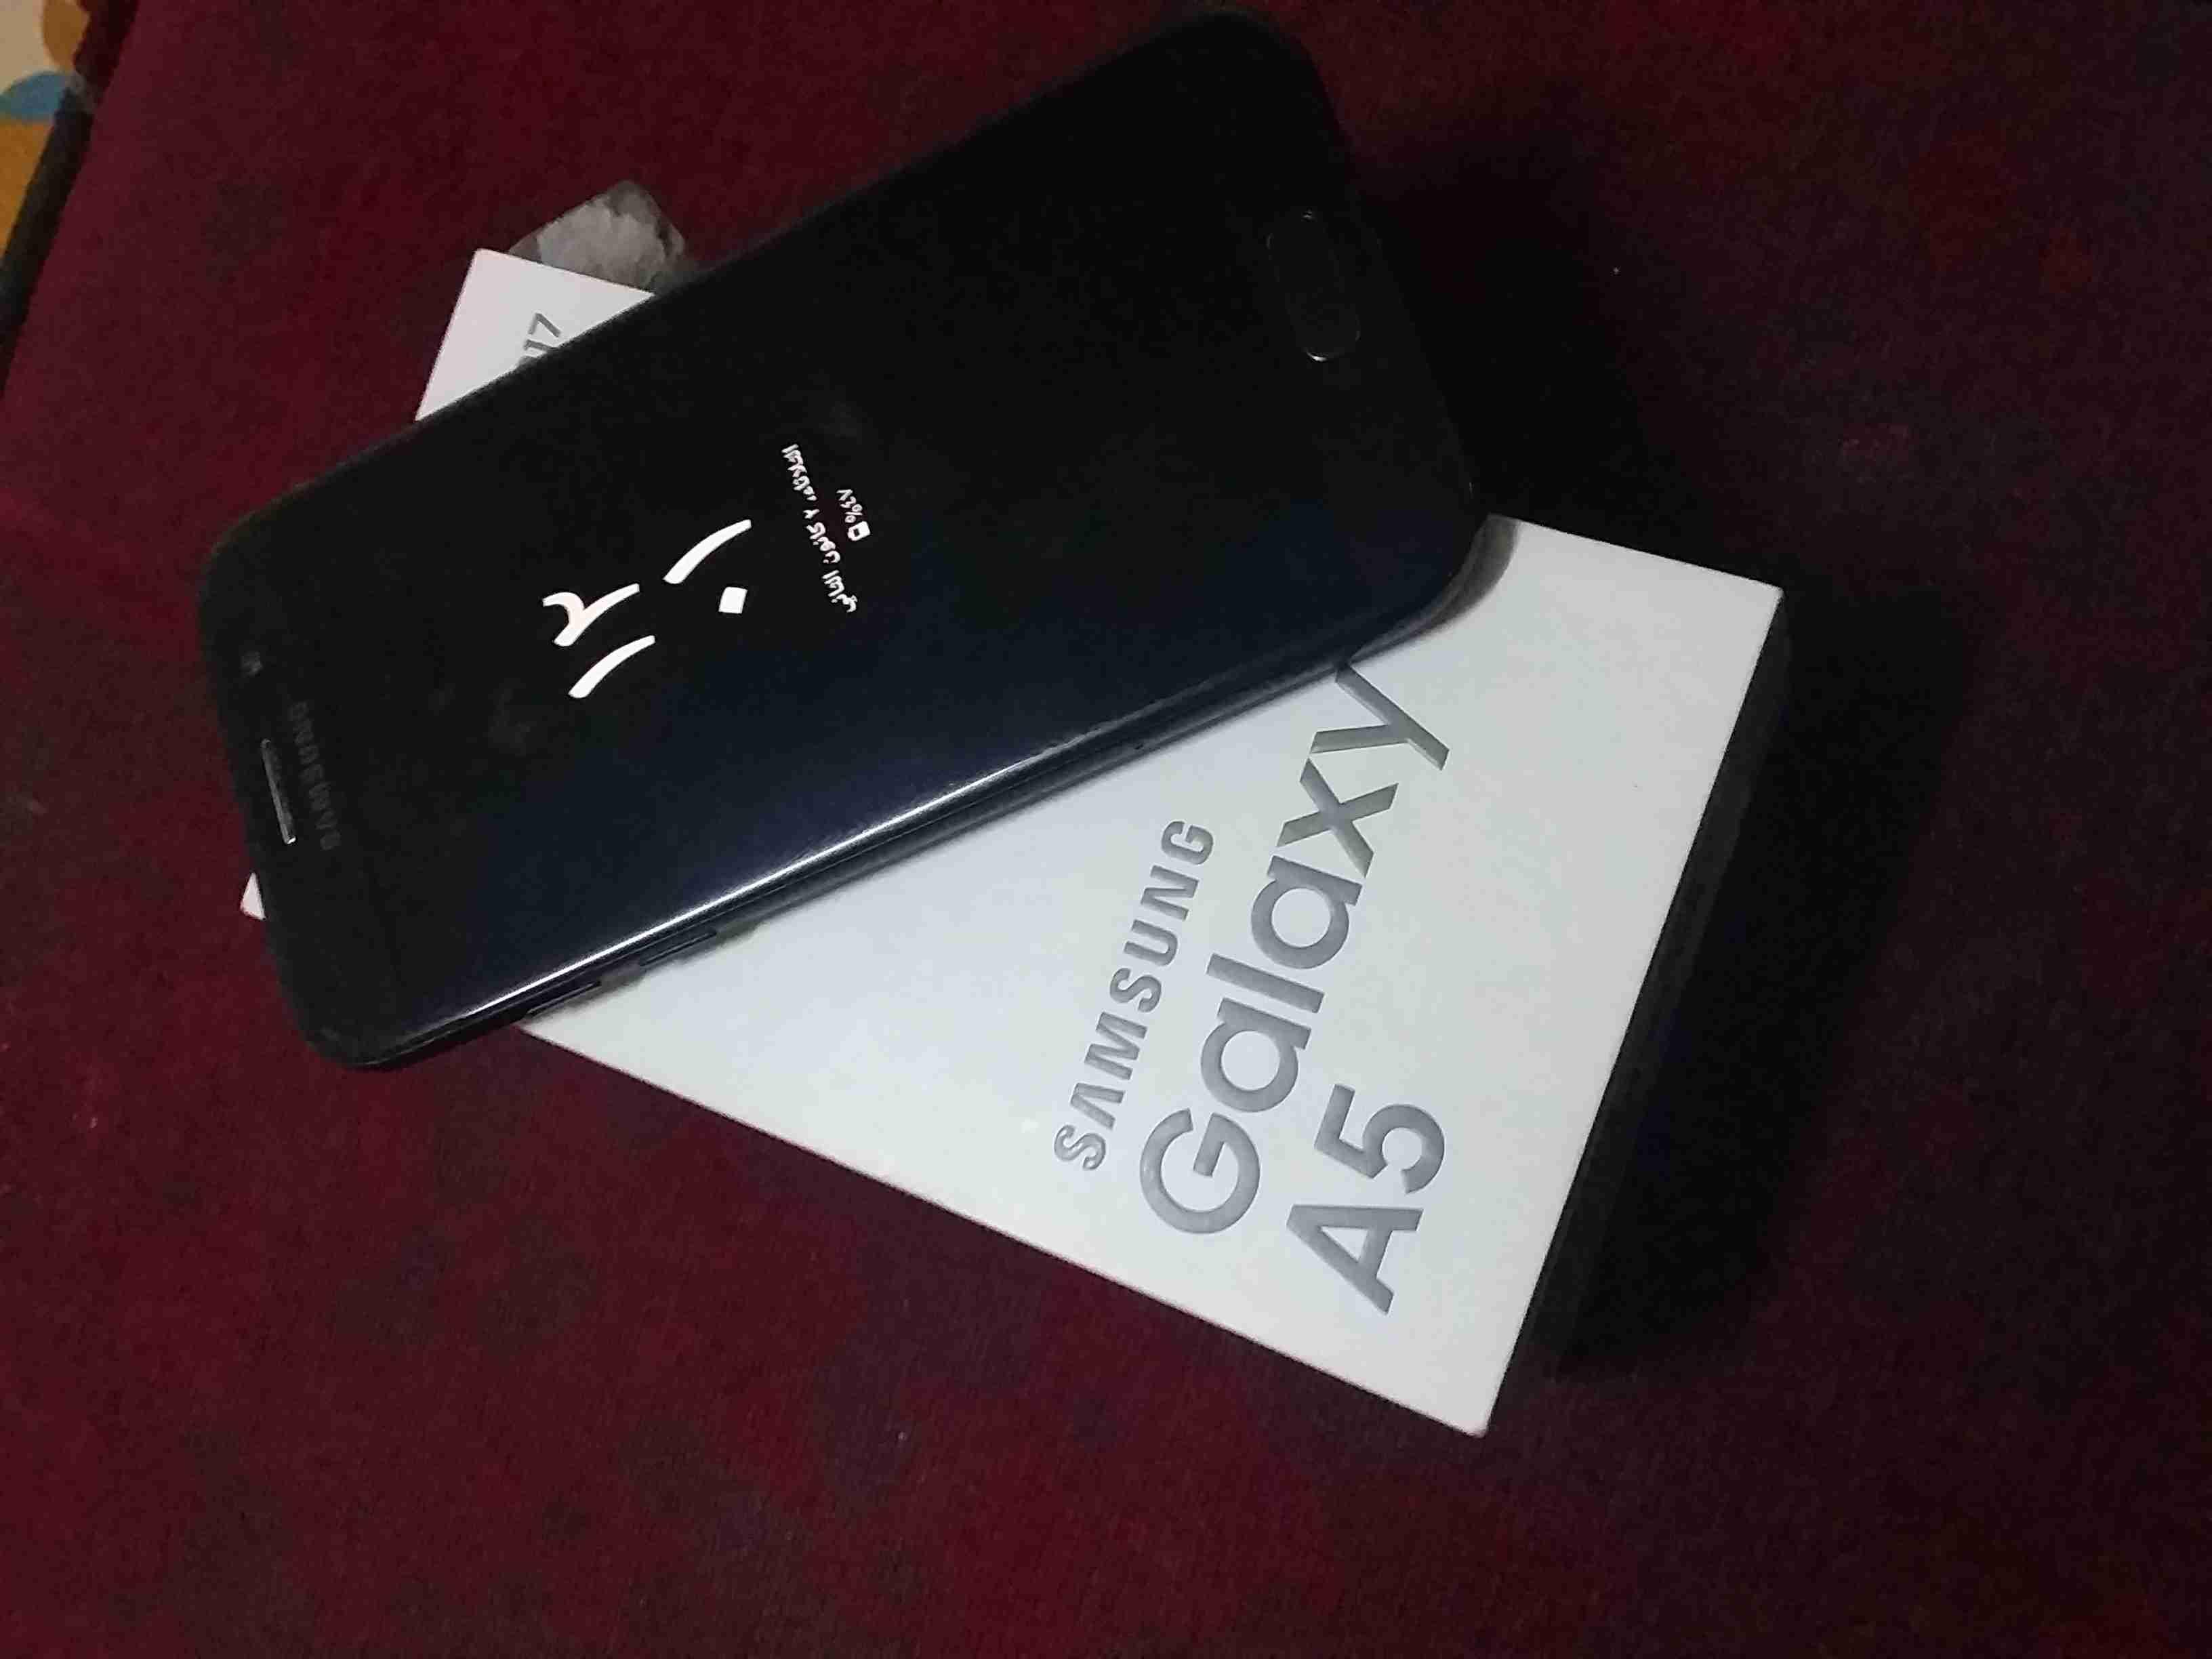 Sony Xz2 سوني xz2 مستعمل بحالة جديد-  سامسونج A5 2017 لا تنسَ...